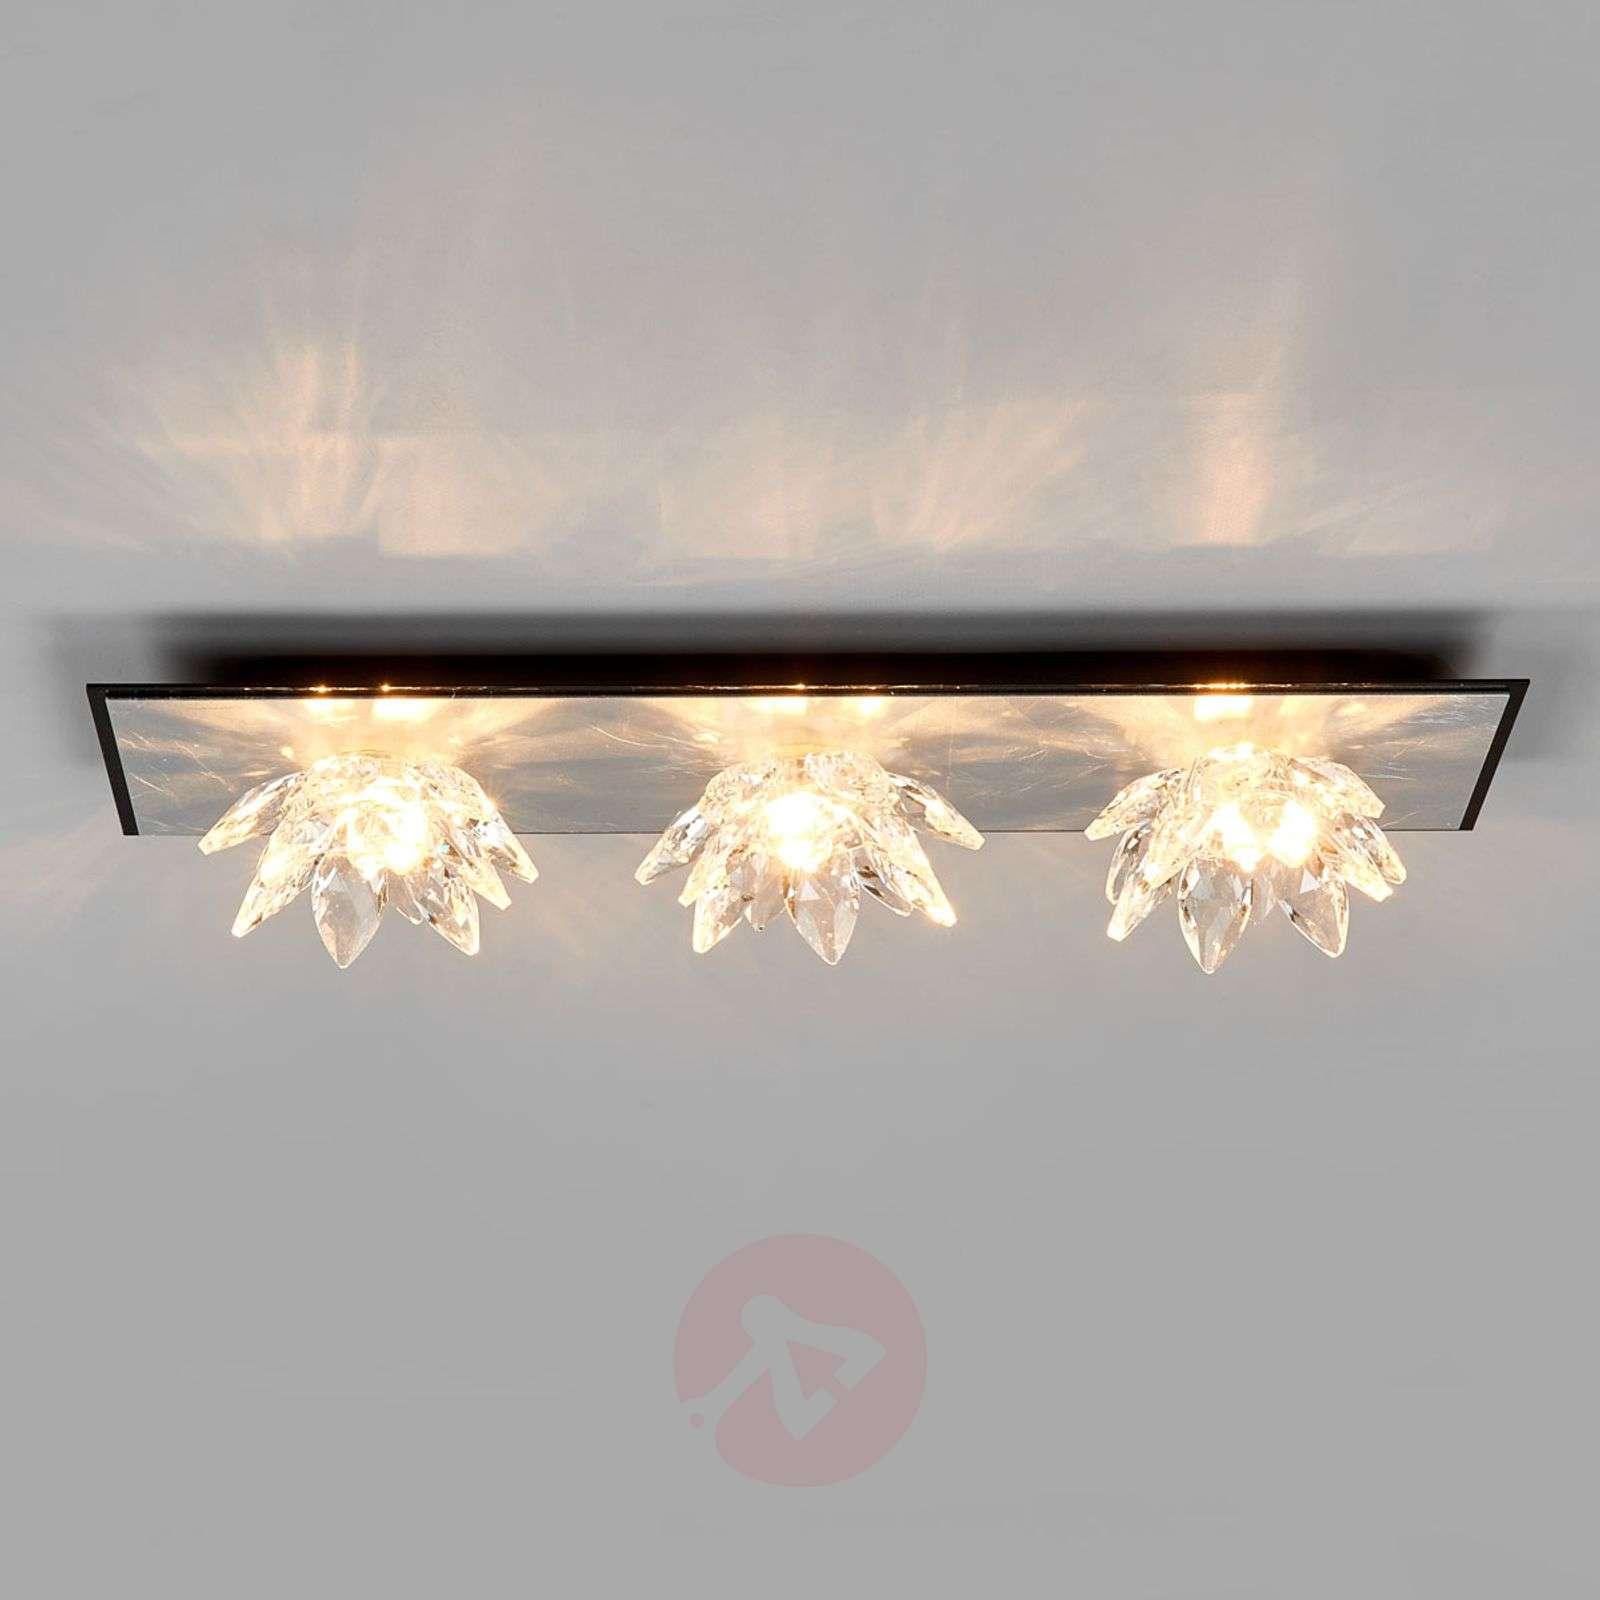 Fiore Cristallo, silver leaf ceiling light, 3-bulb-5505554-01